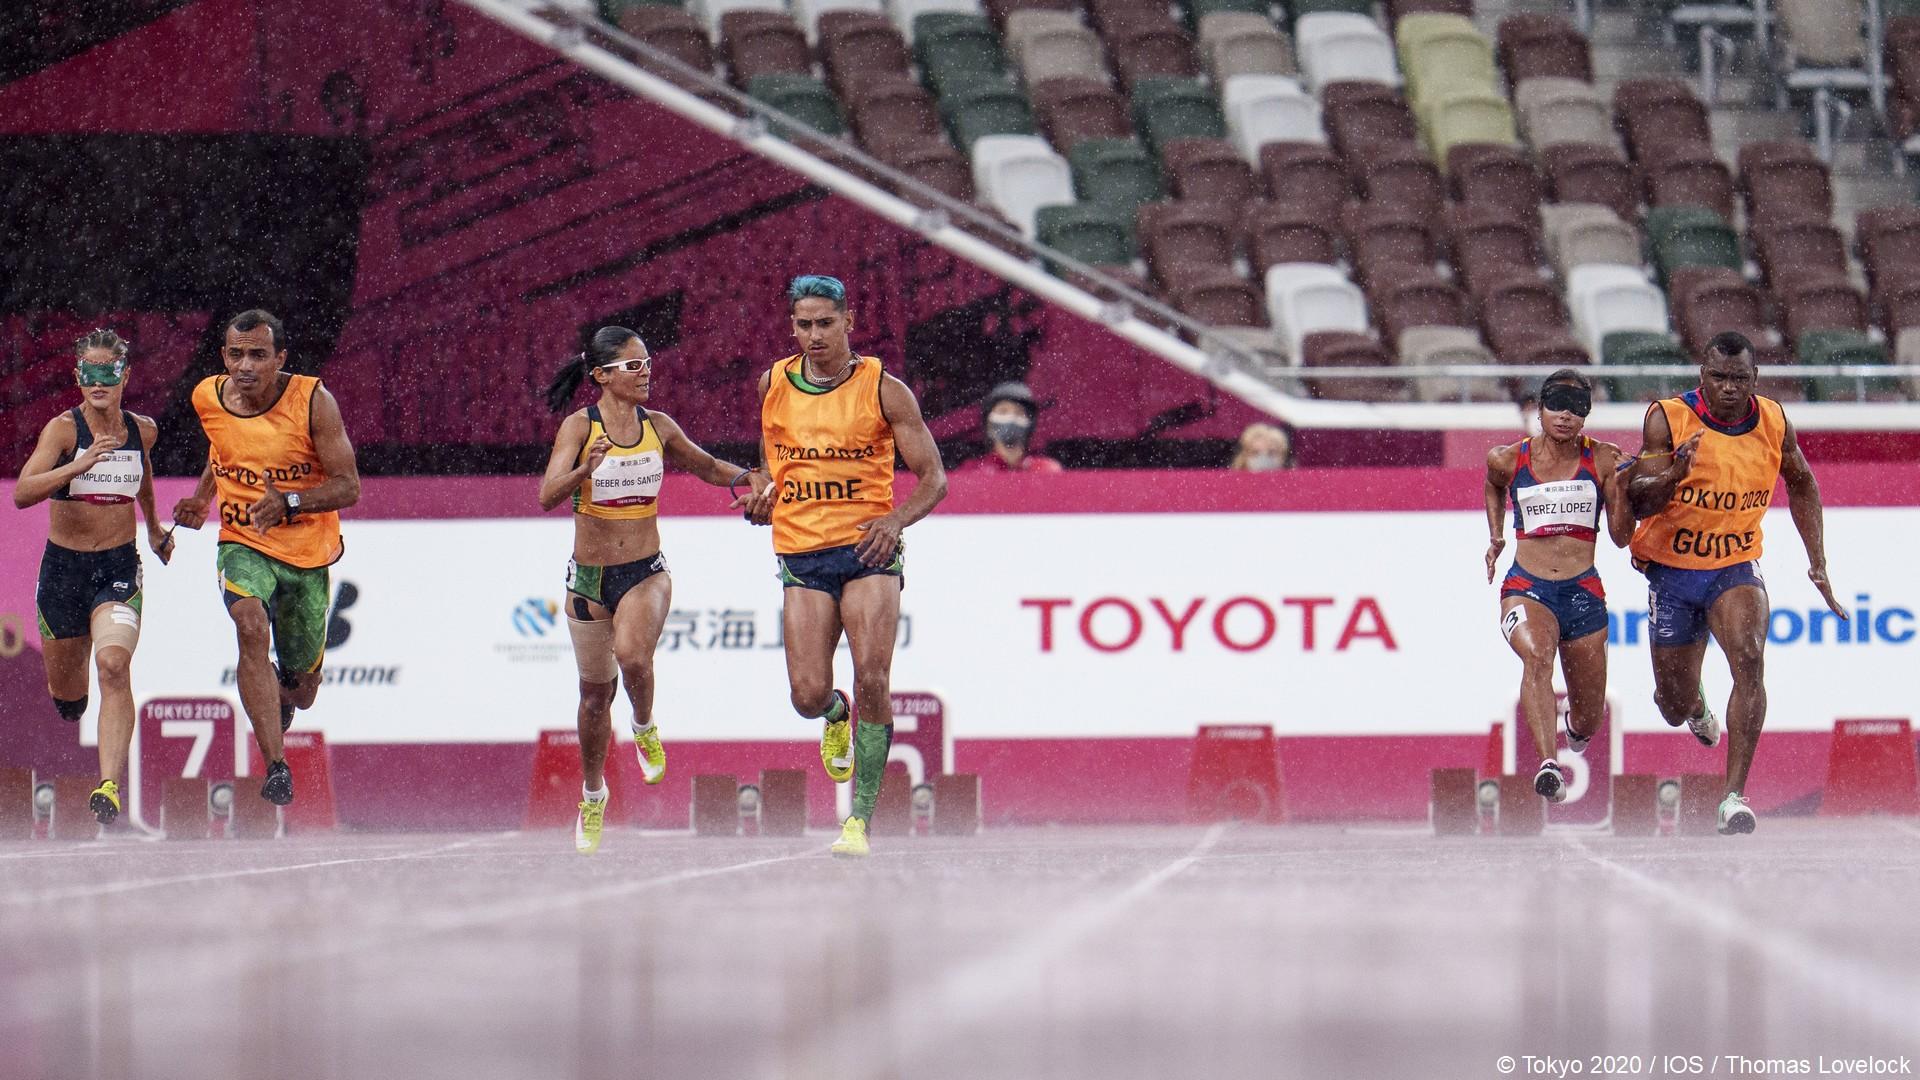 Tokyo 2020 – Paralympiques (15) Athlétisme